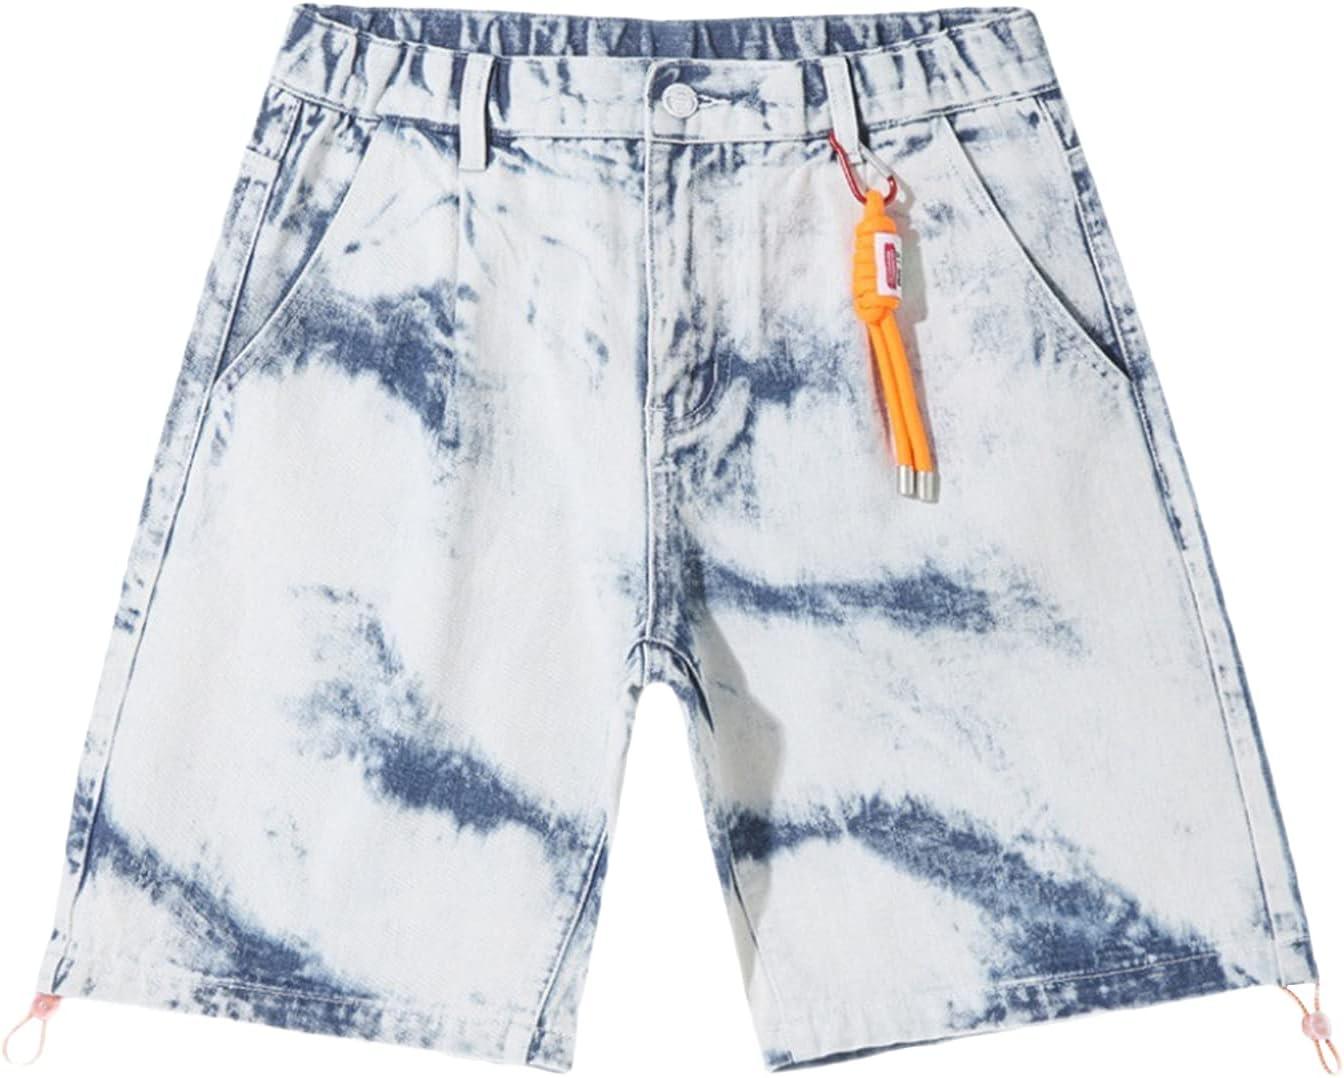 Men's Casual Fashion Tie-dye Denim Short Loose Large Size Comfortable Jean Shorts Printed Retro Street Trend Shorts (Blue,3X-Large)